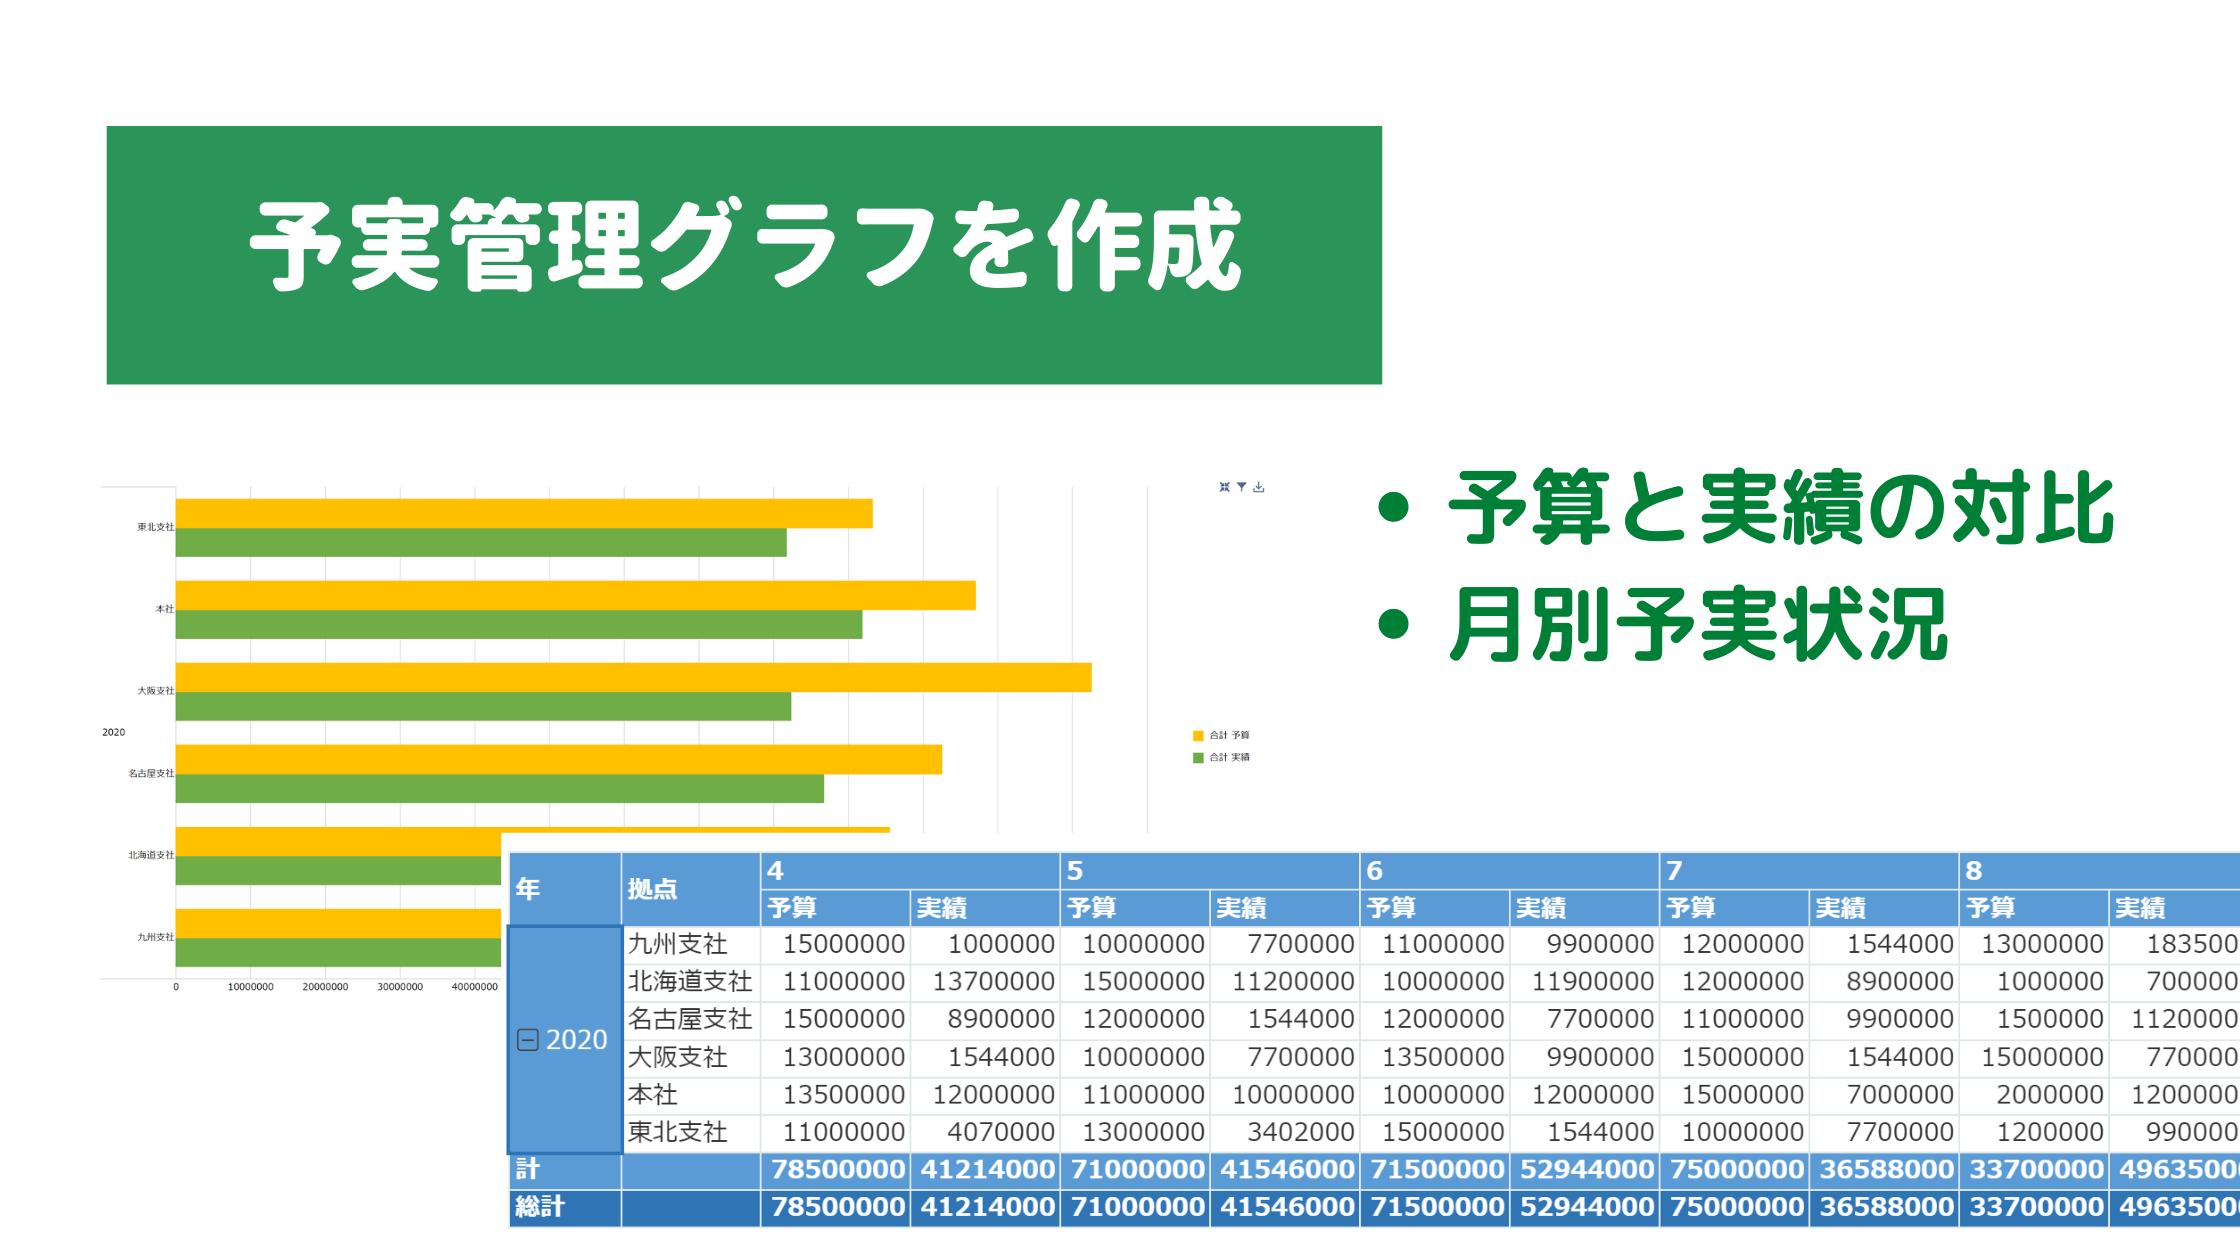 kintoneで予実管理グラフを作成